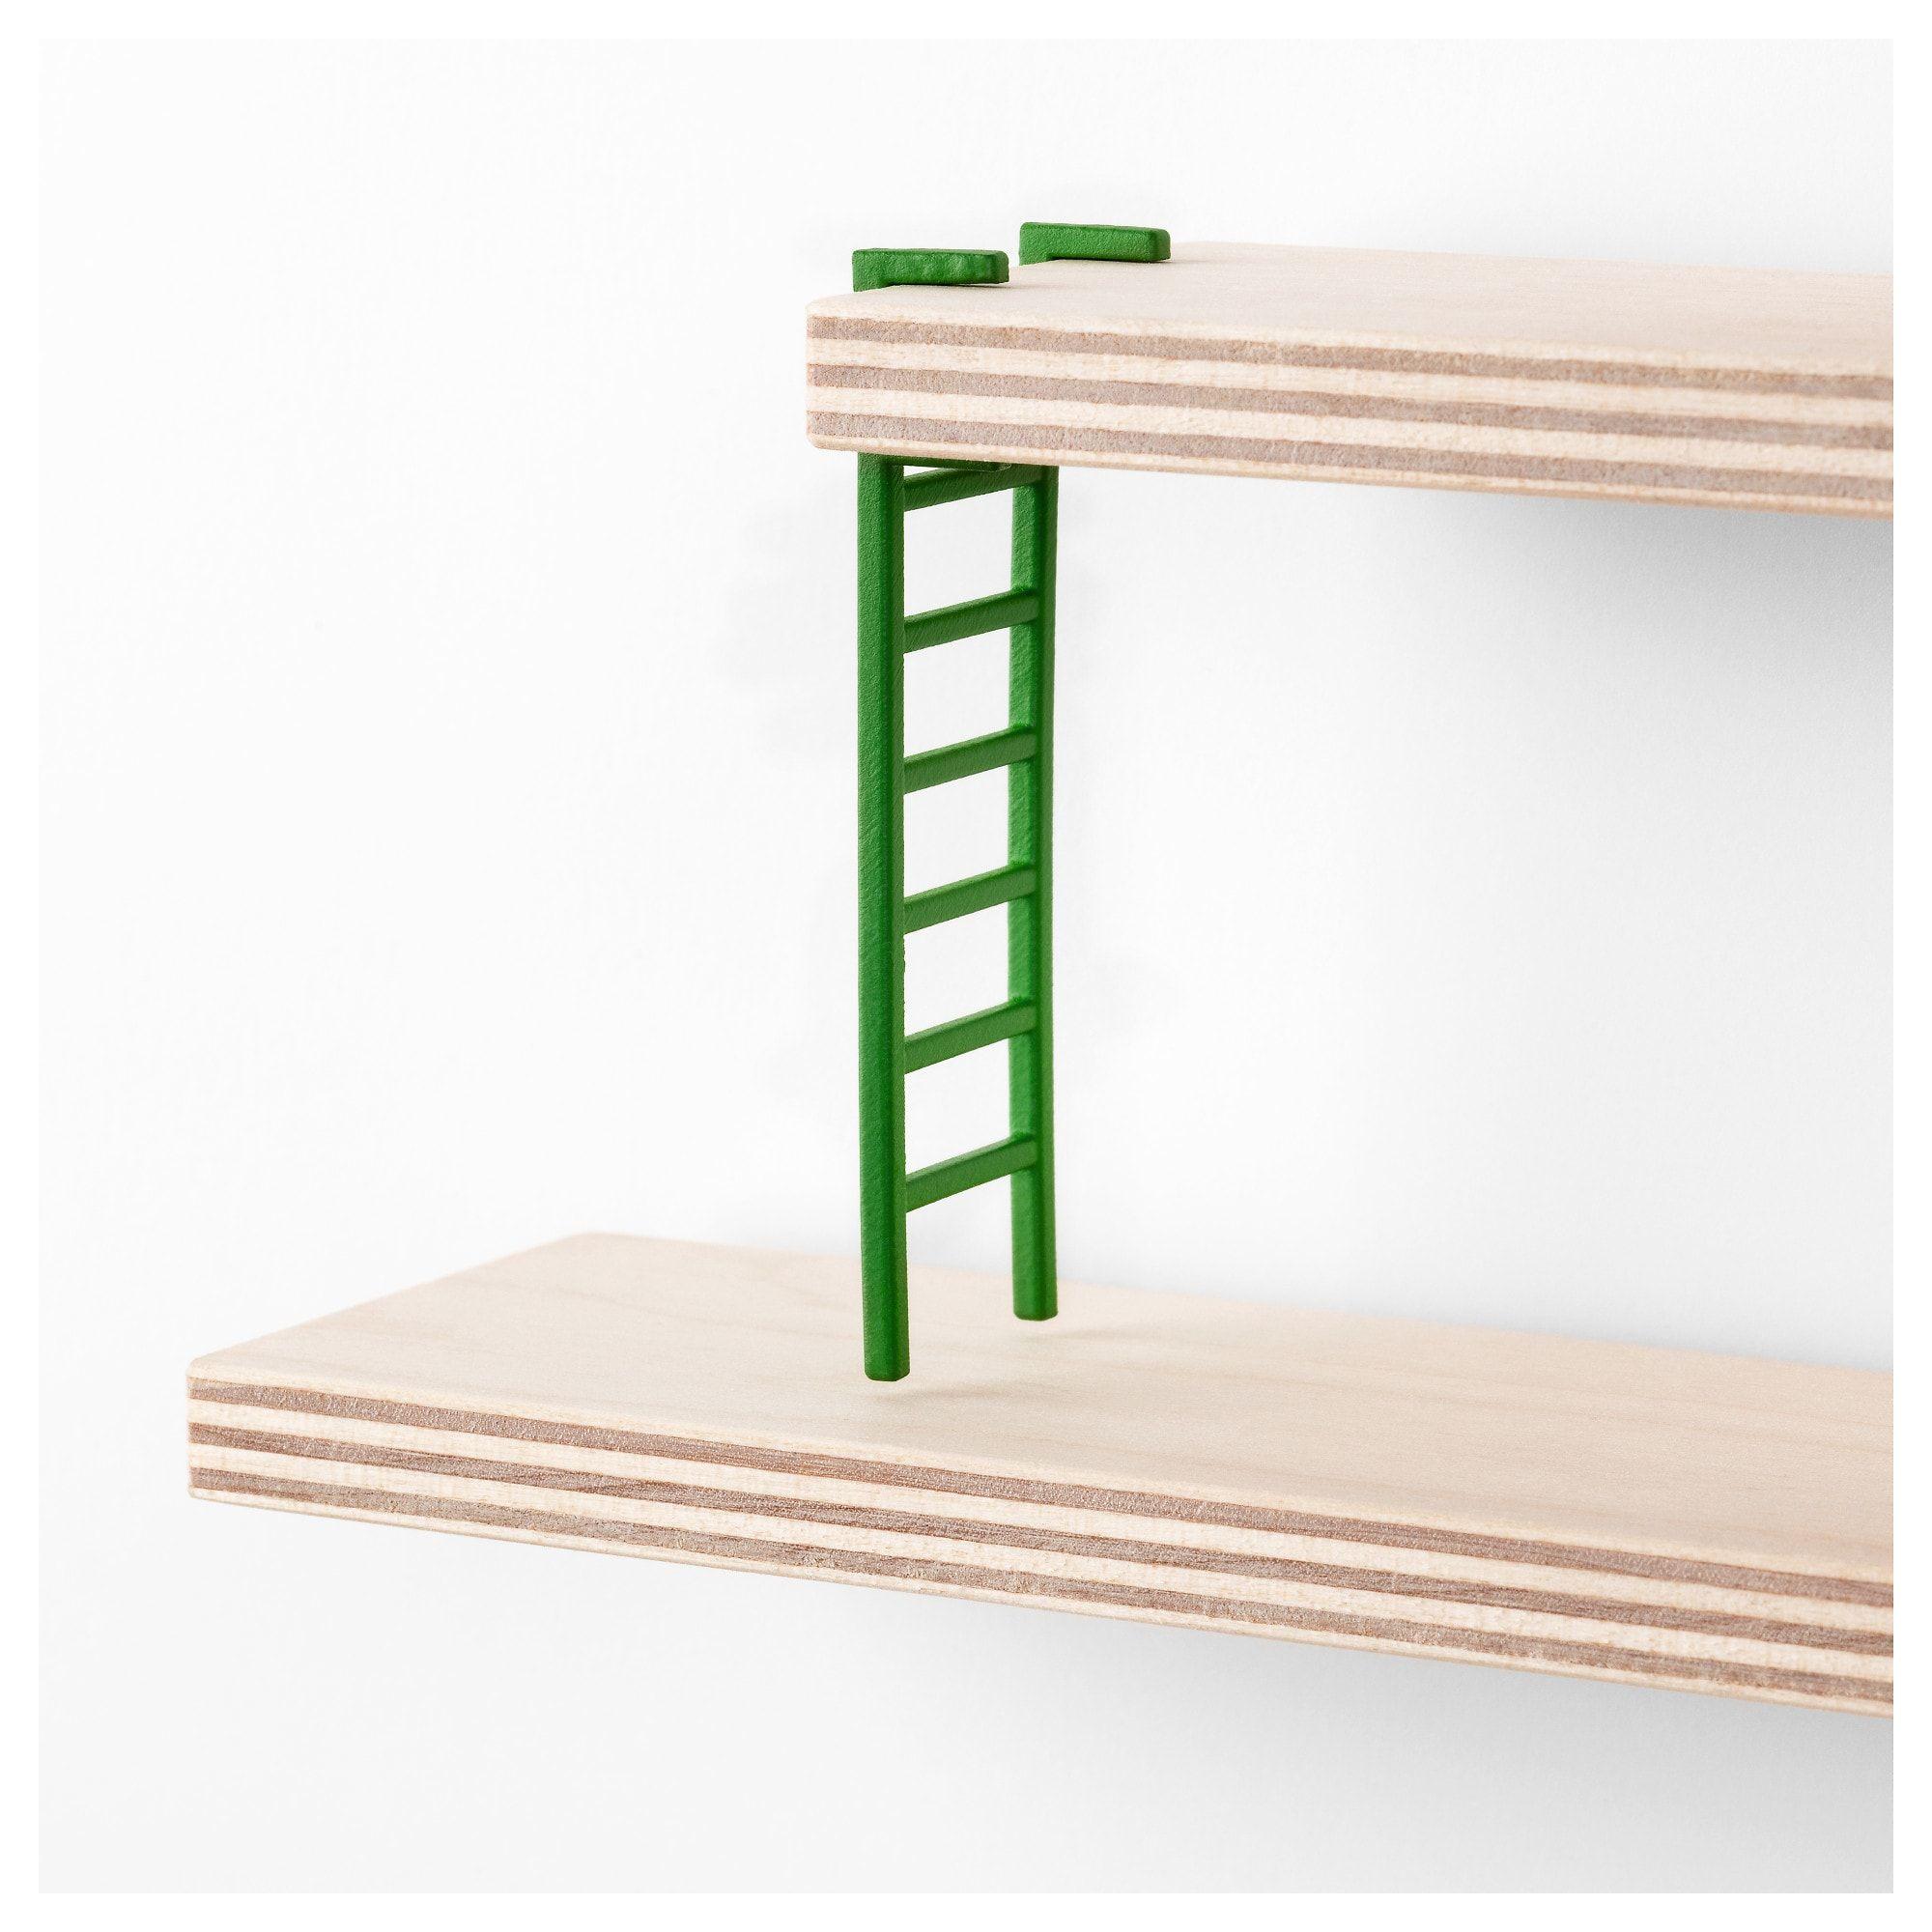 Lustigt Wandregal Regalwand Wandregal Und Wandregal Ikea